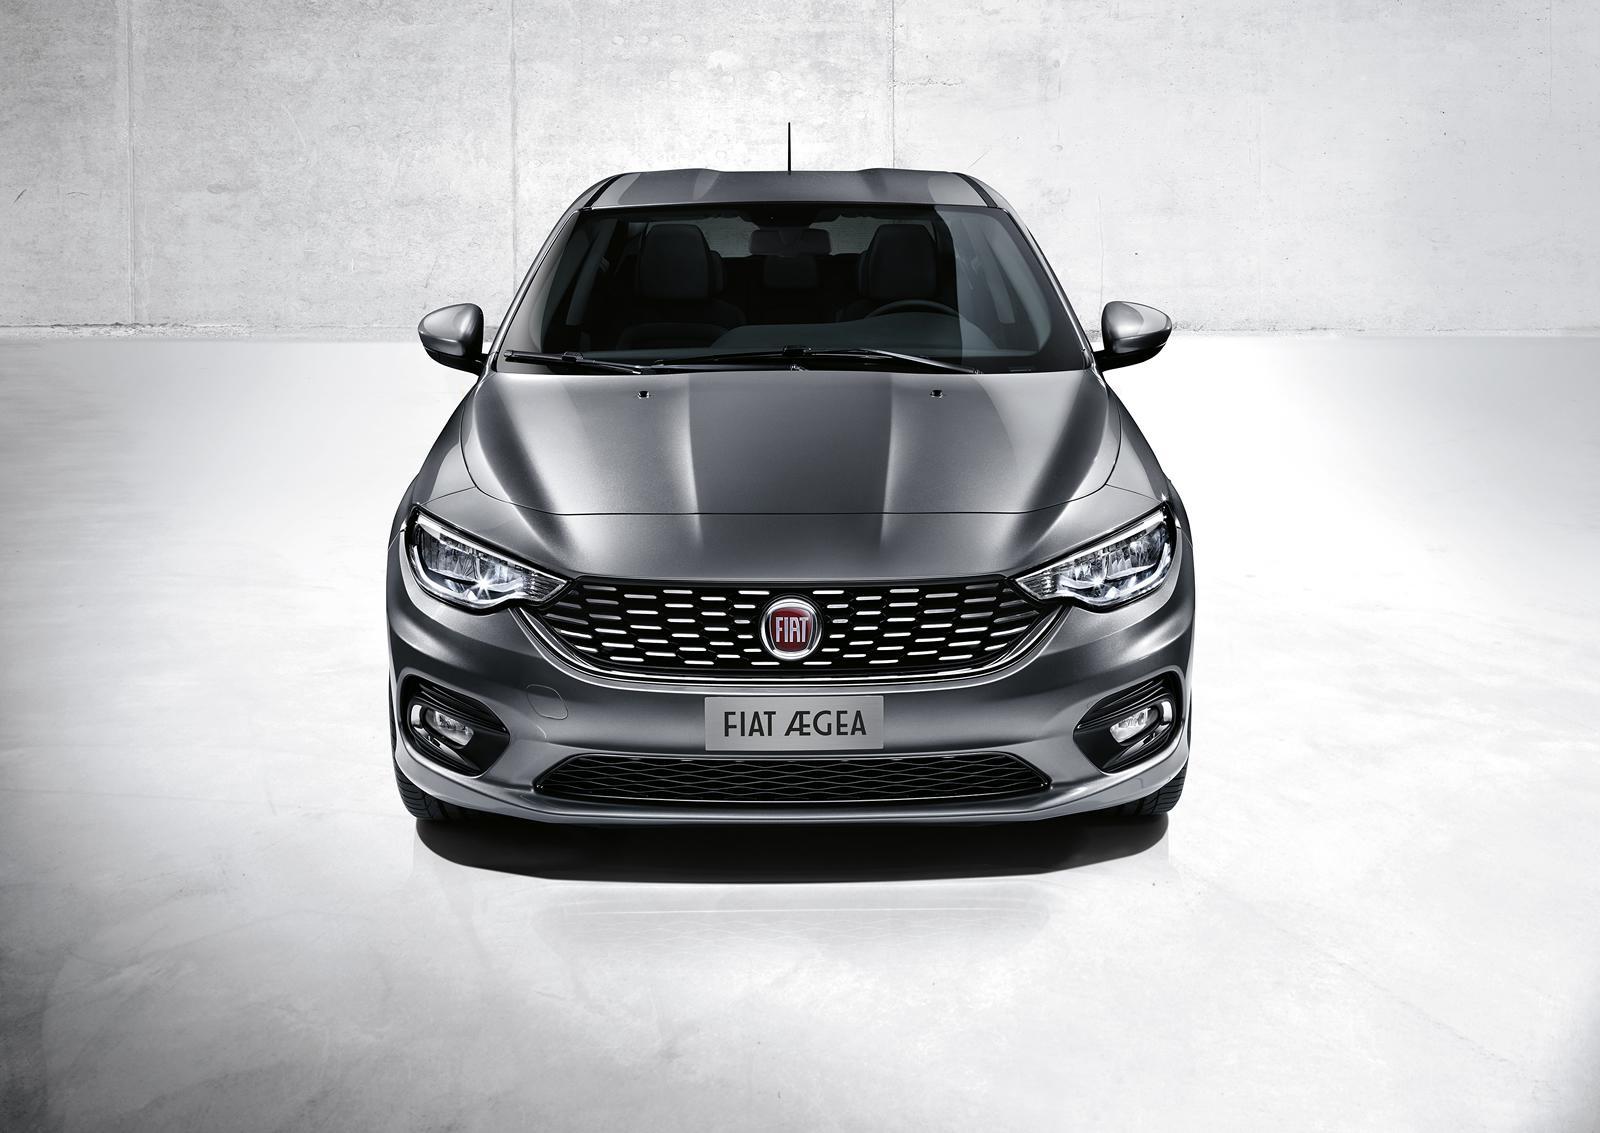 Fiat Aegea, la nueva berlina de la marca italiana